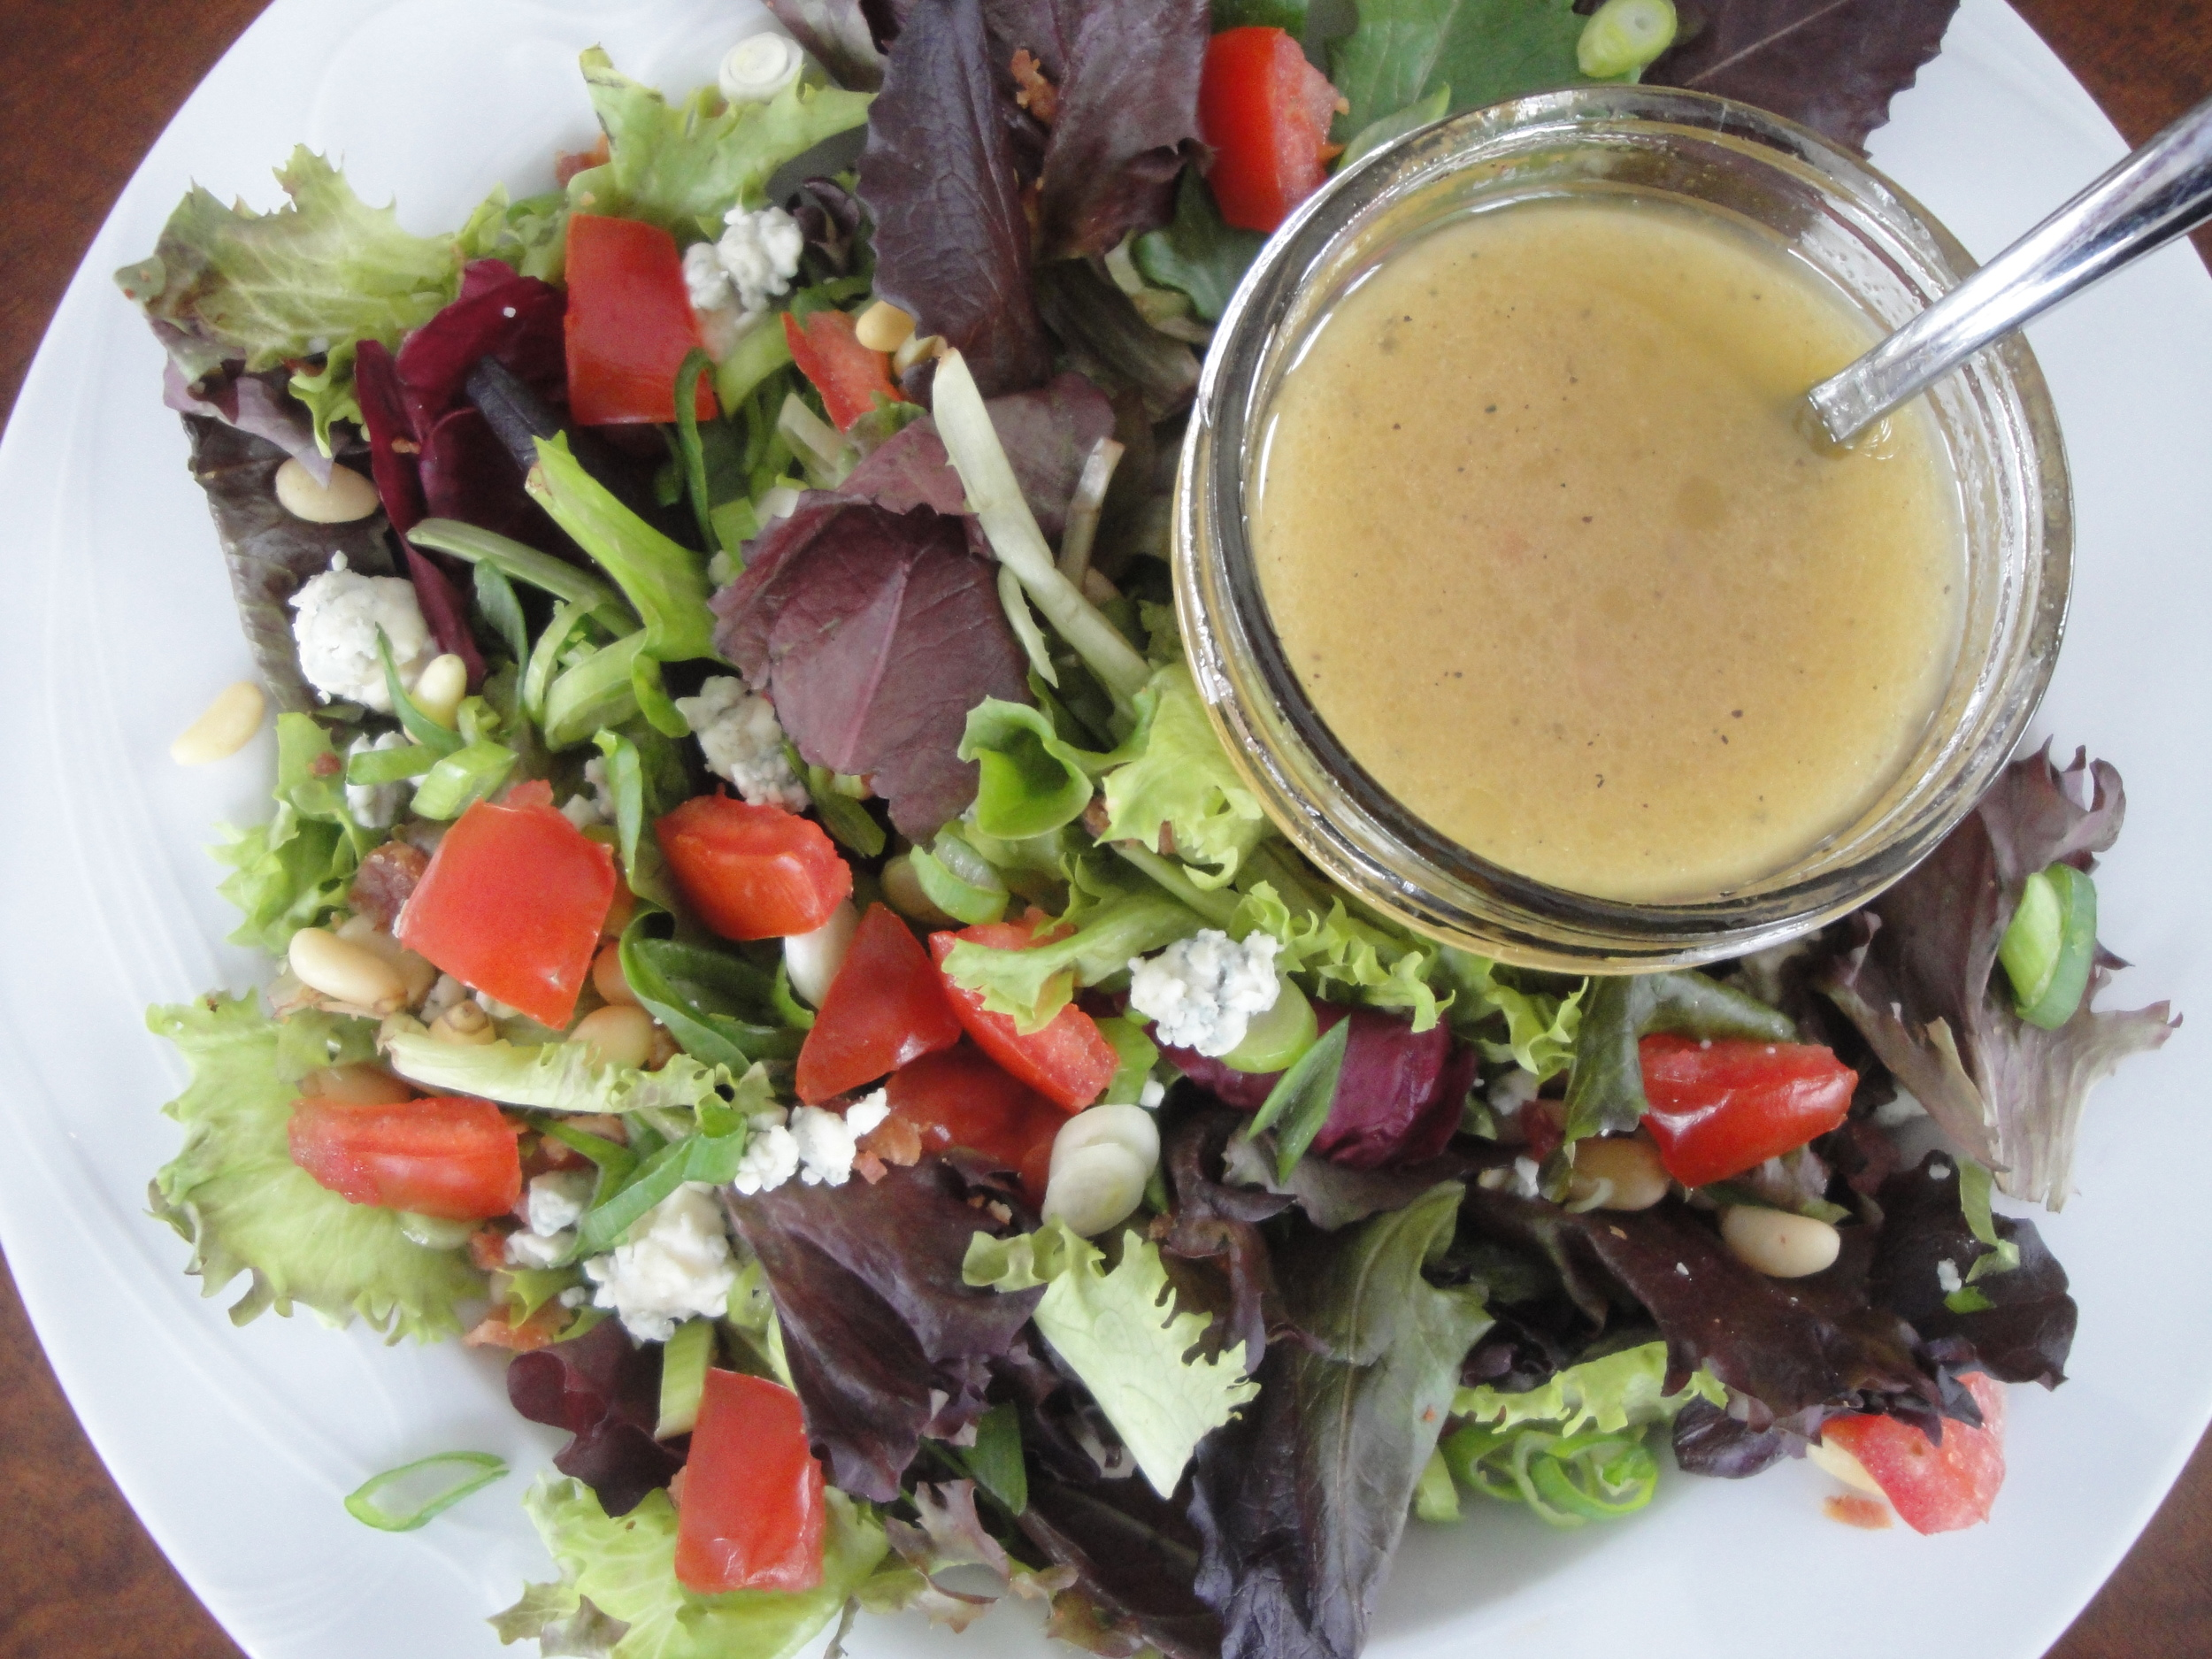 Salad with dressing.jpg